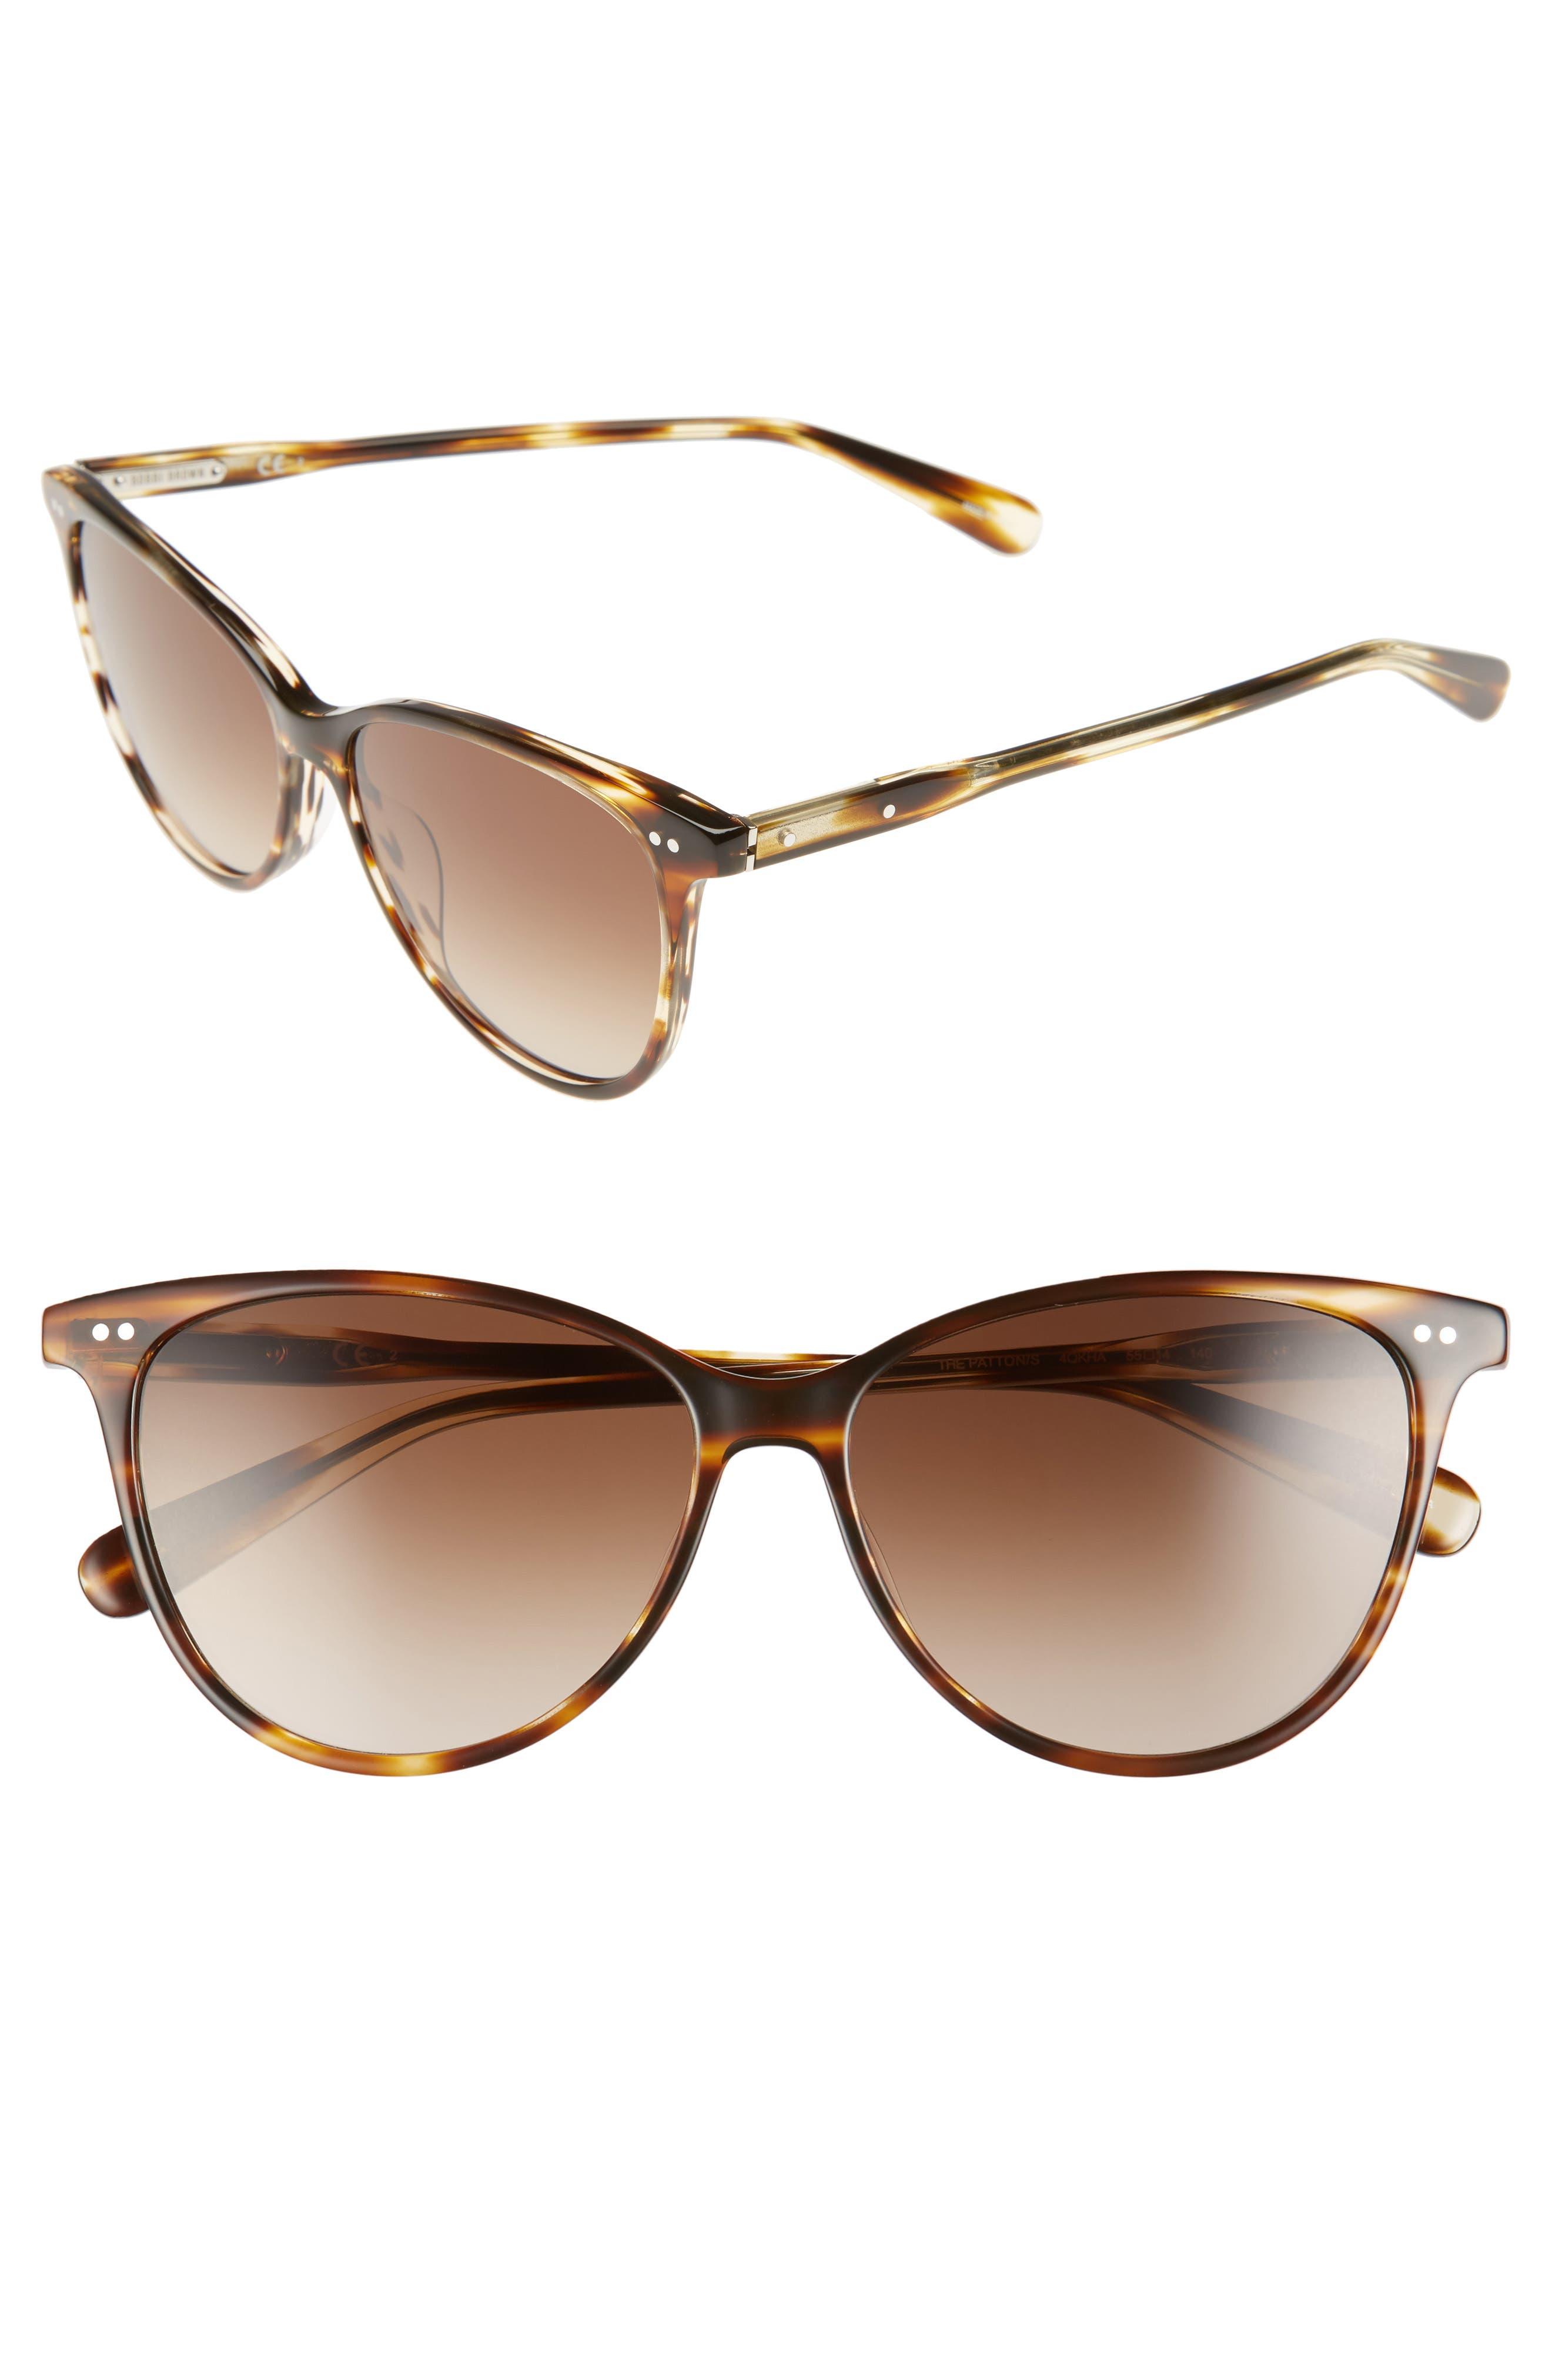 Bobbi Brown The Patton 55mm Gradient Cat Eye Sunglasses